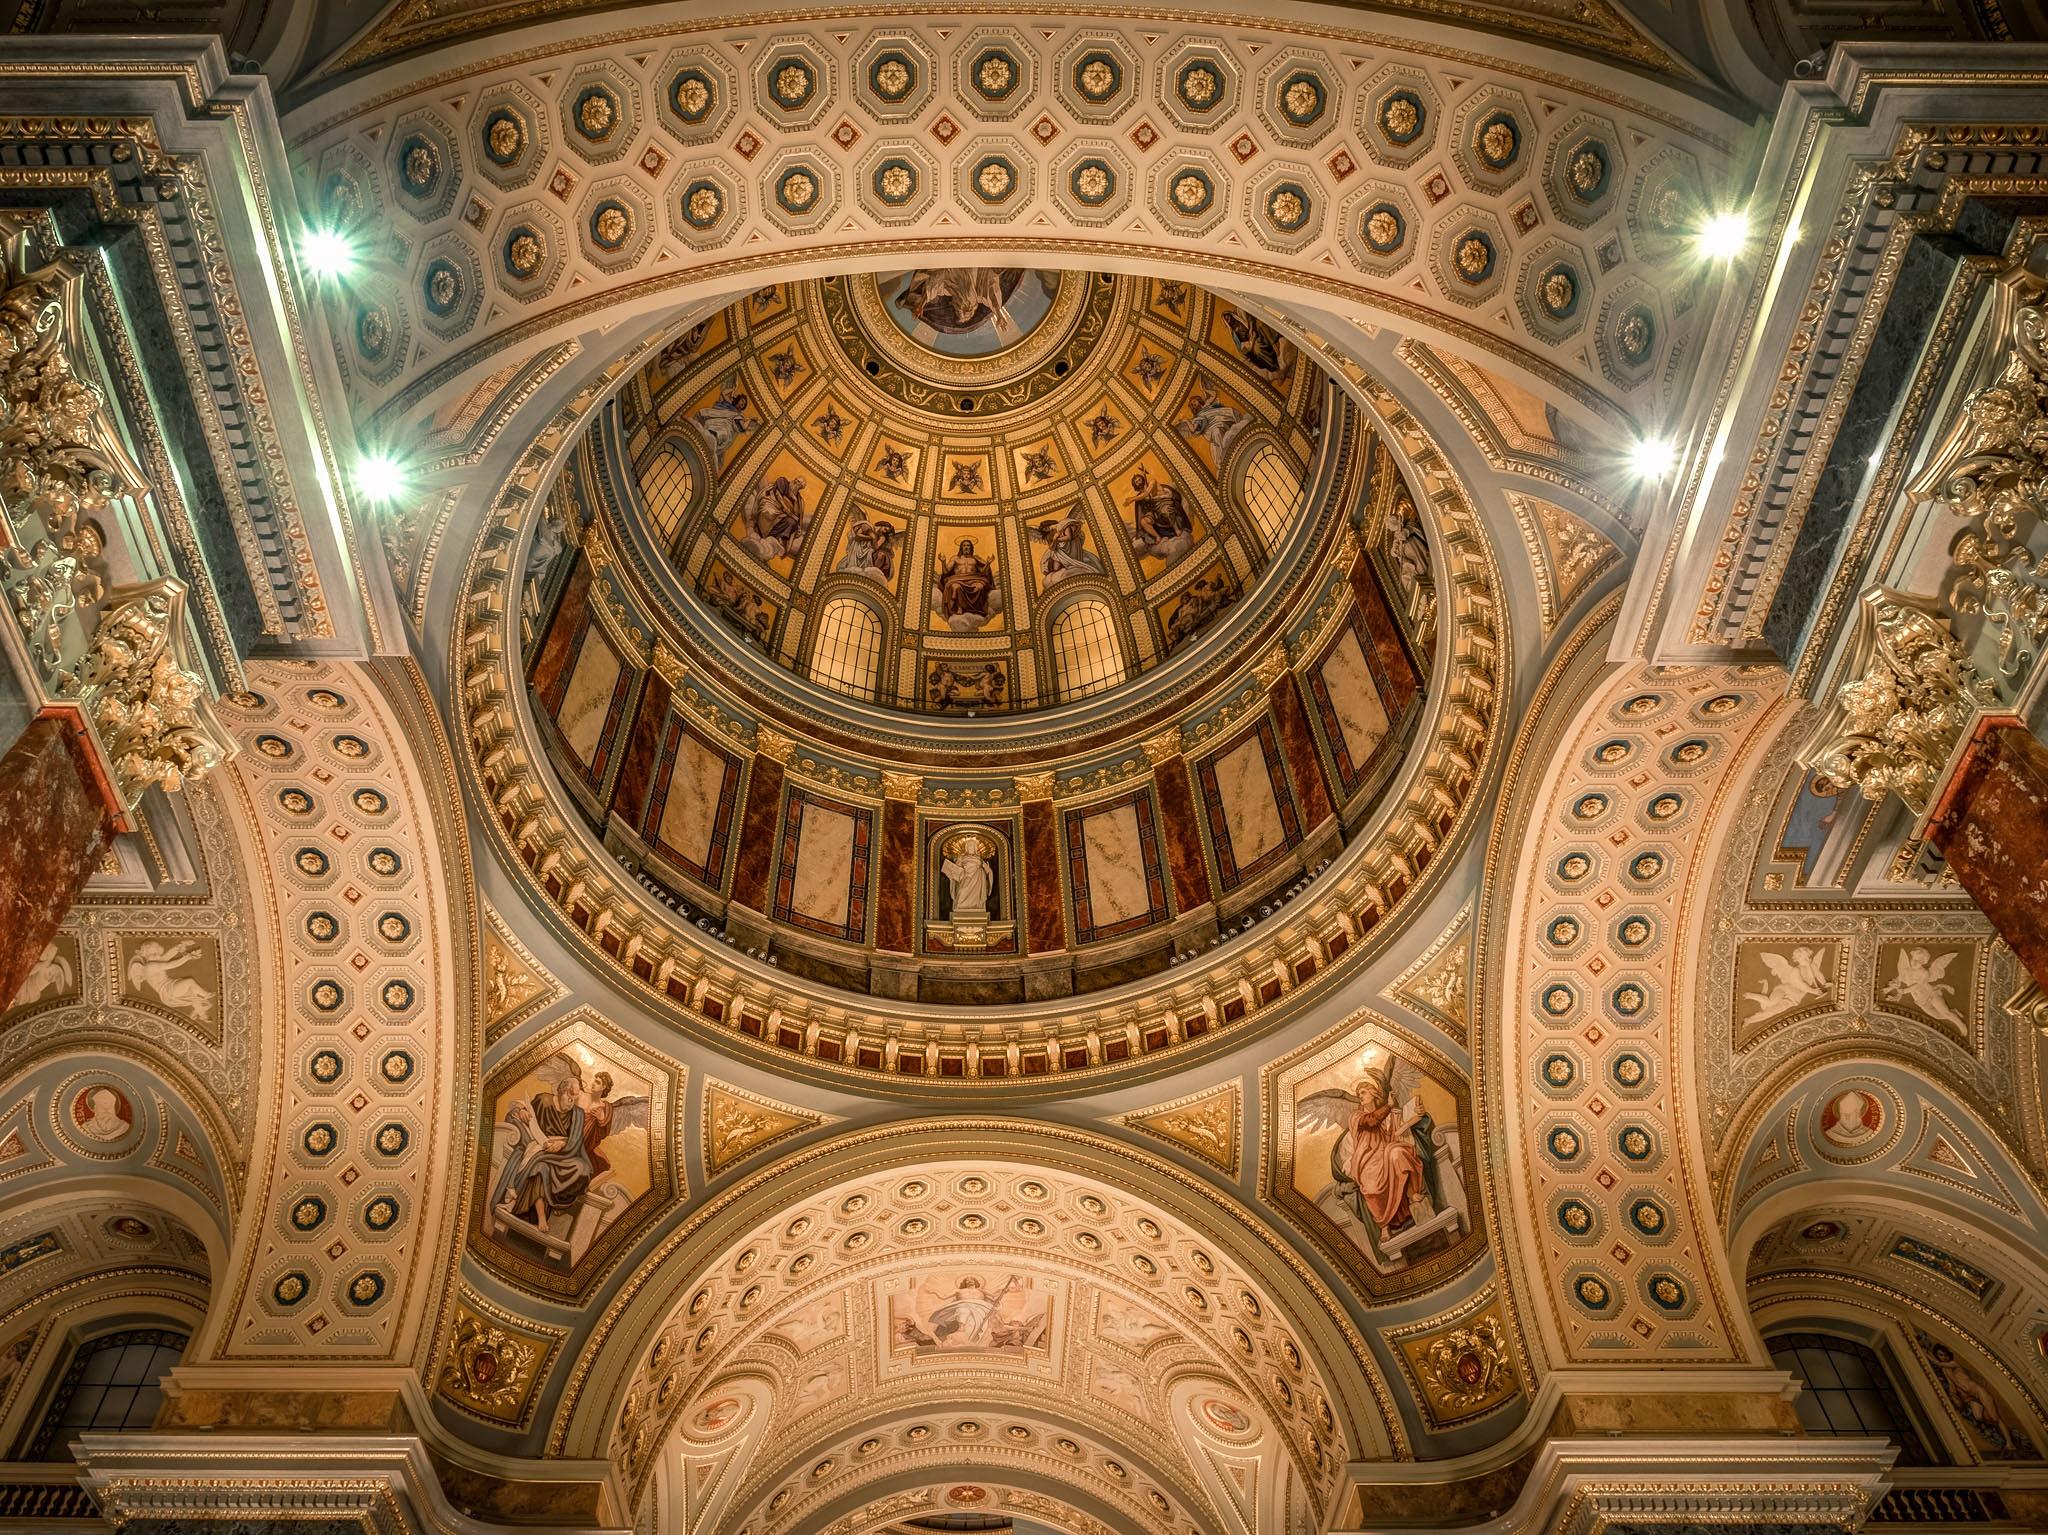 St. Stephen's Basilica by Christian Kerkmann Photography